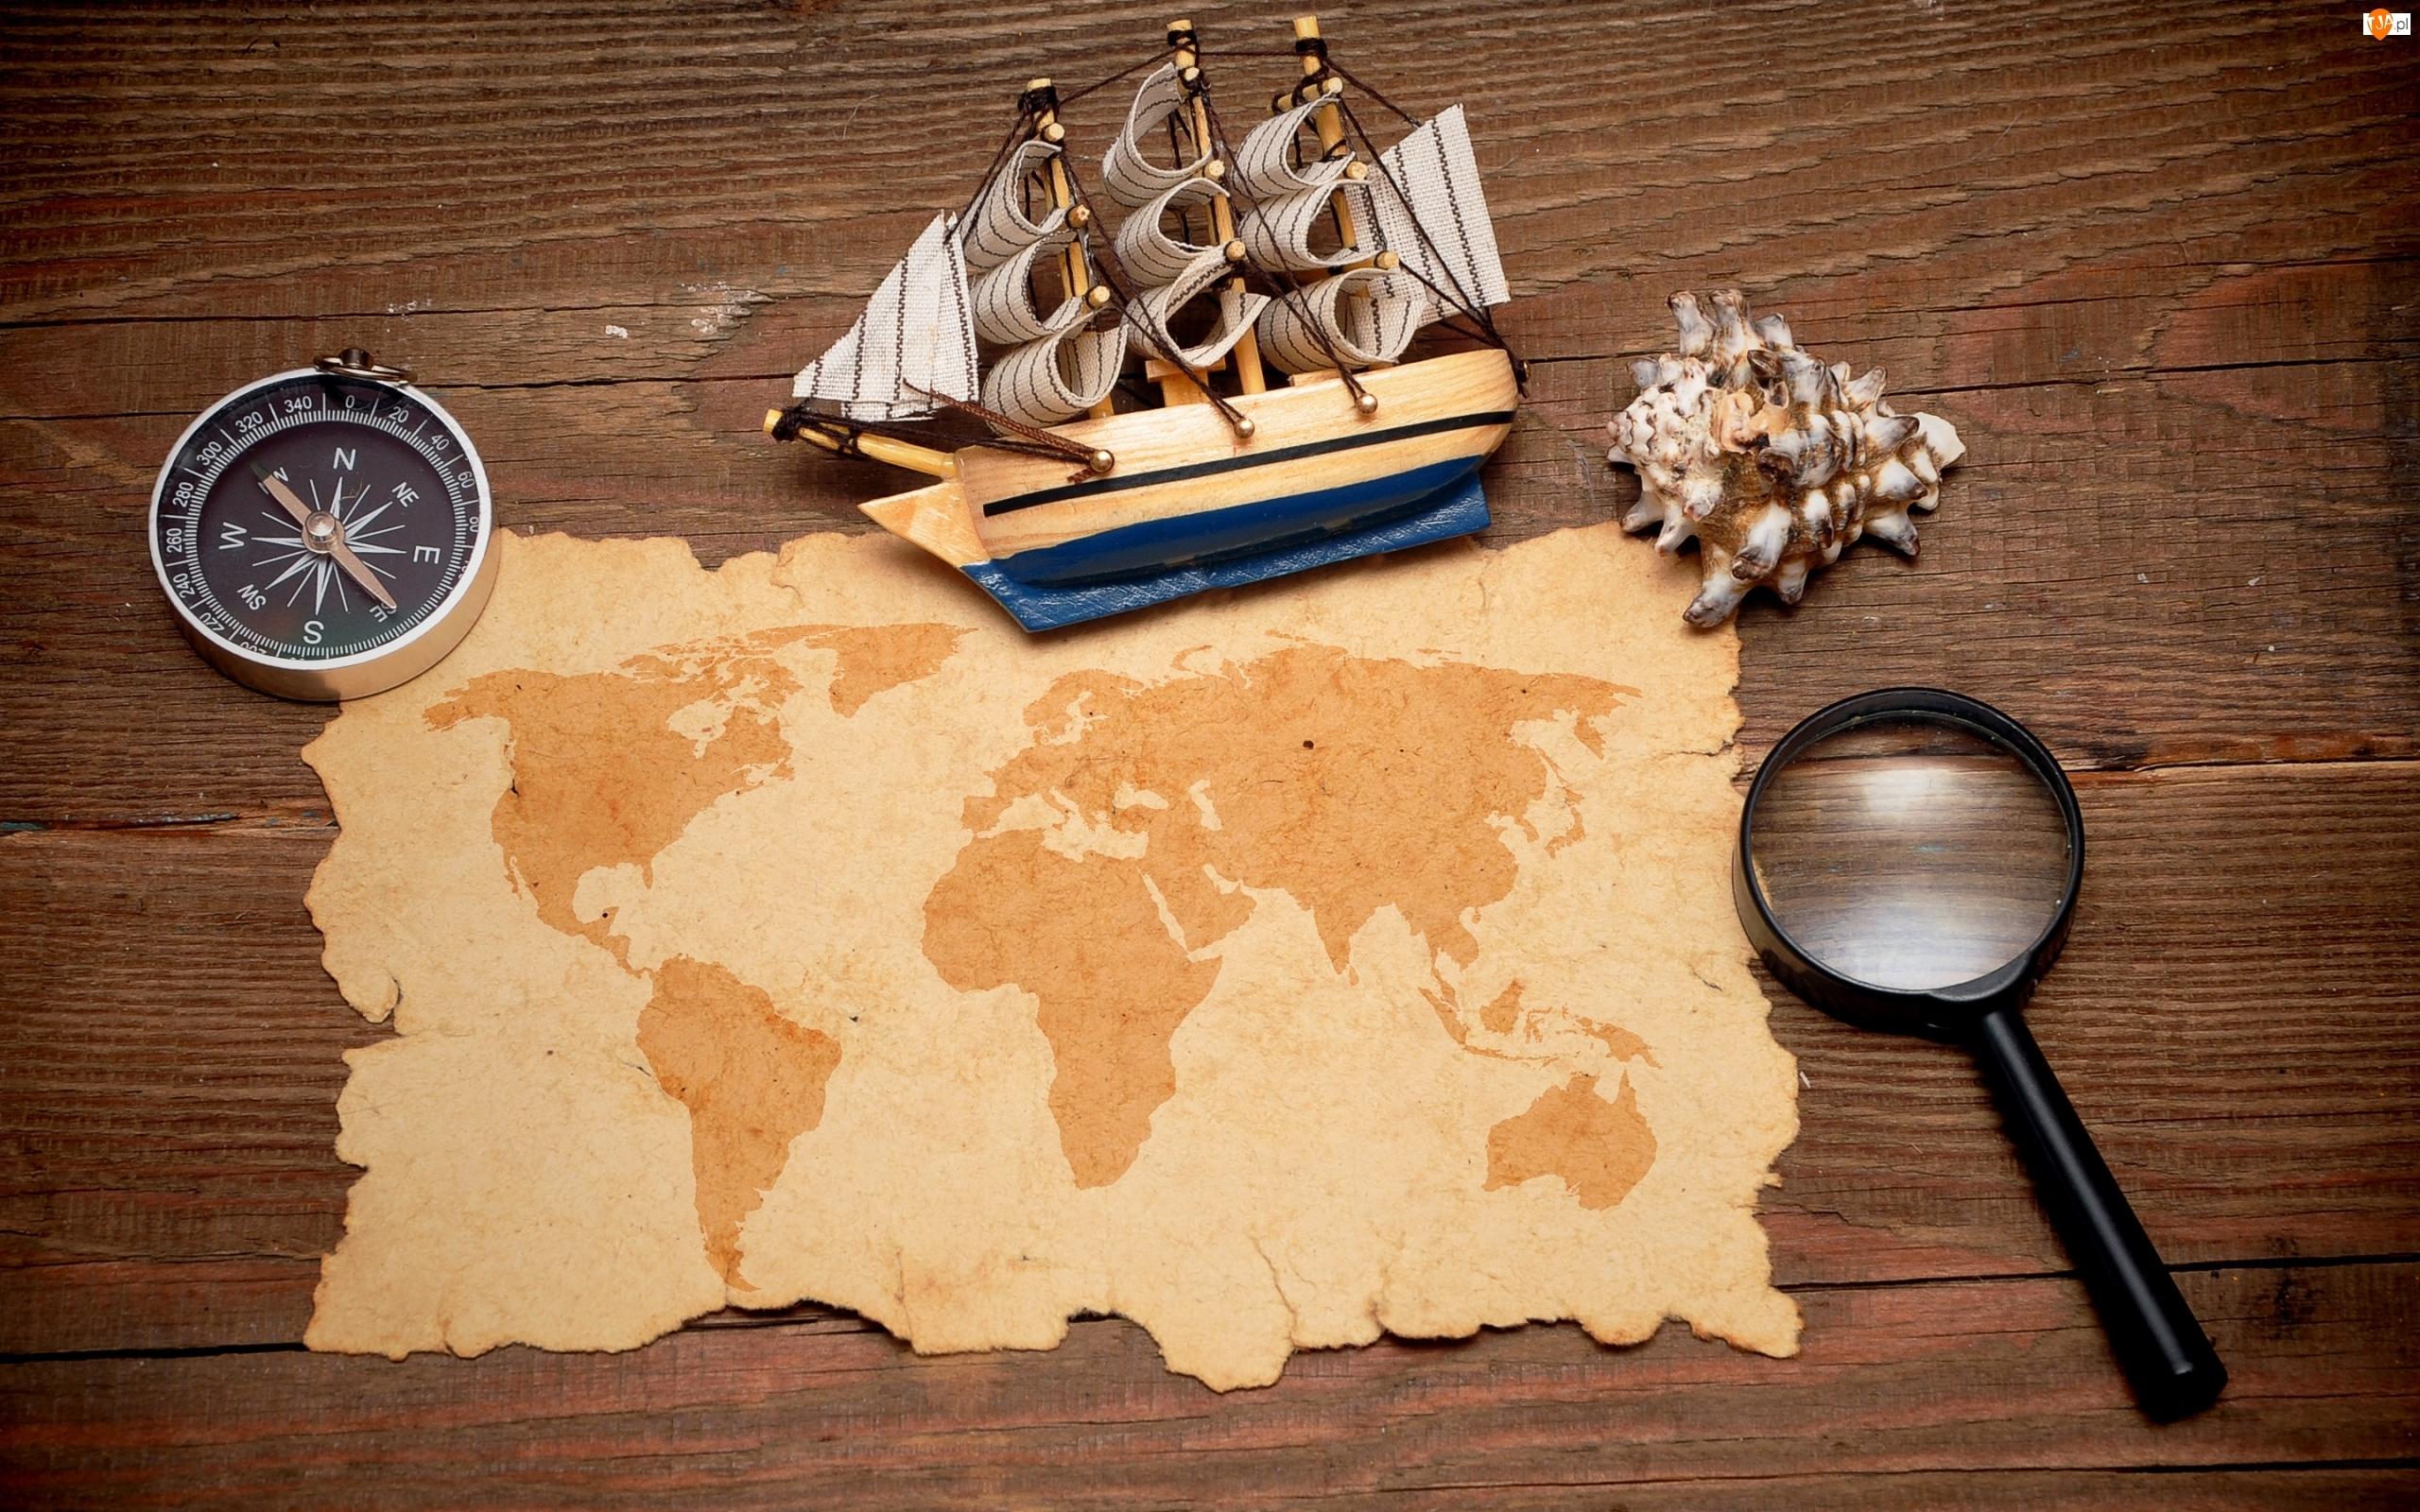 Kompas, Mapa, Lupa, Muszelka, Statek